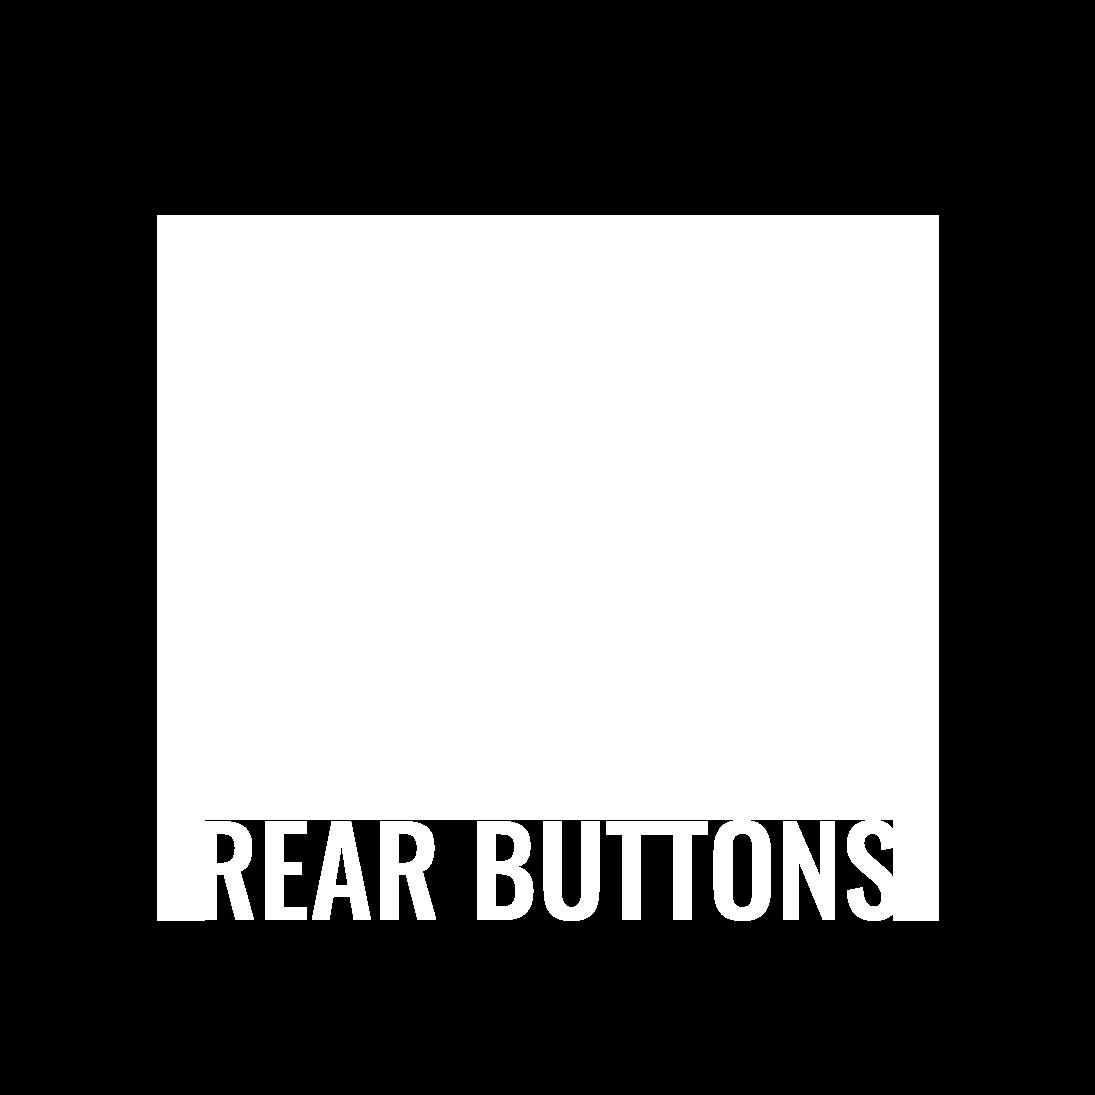 Rear Buttons